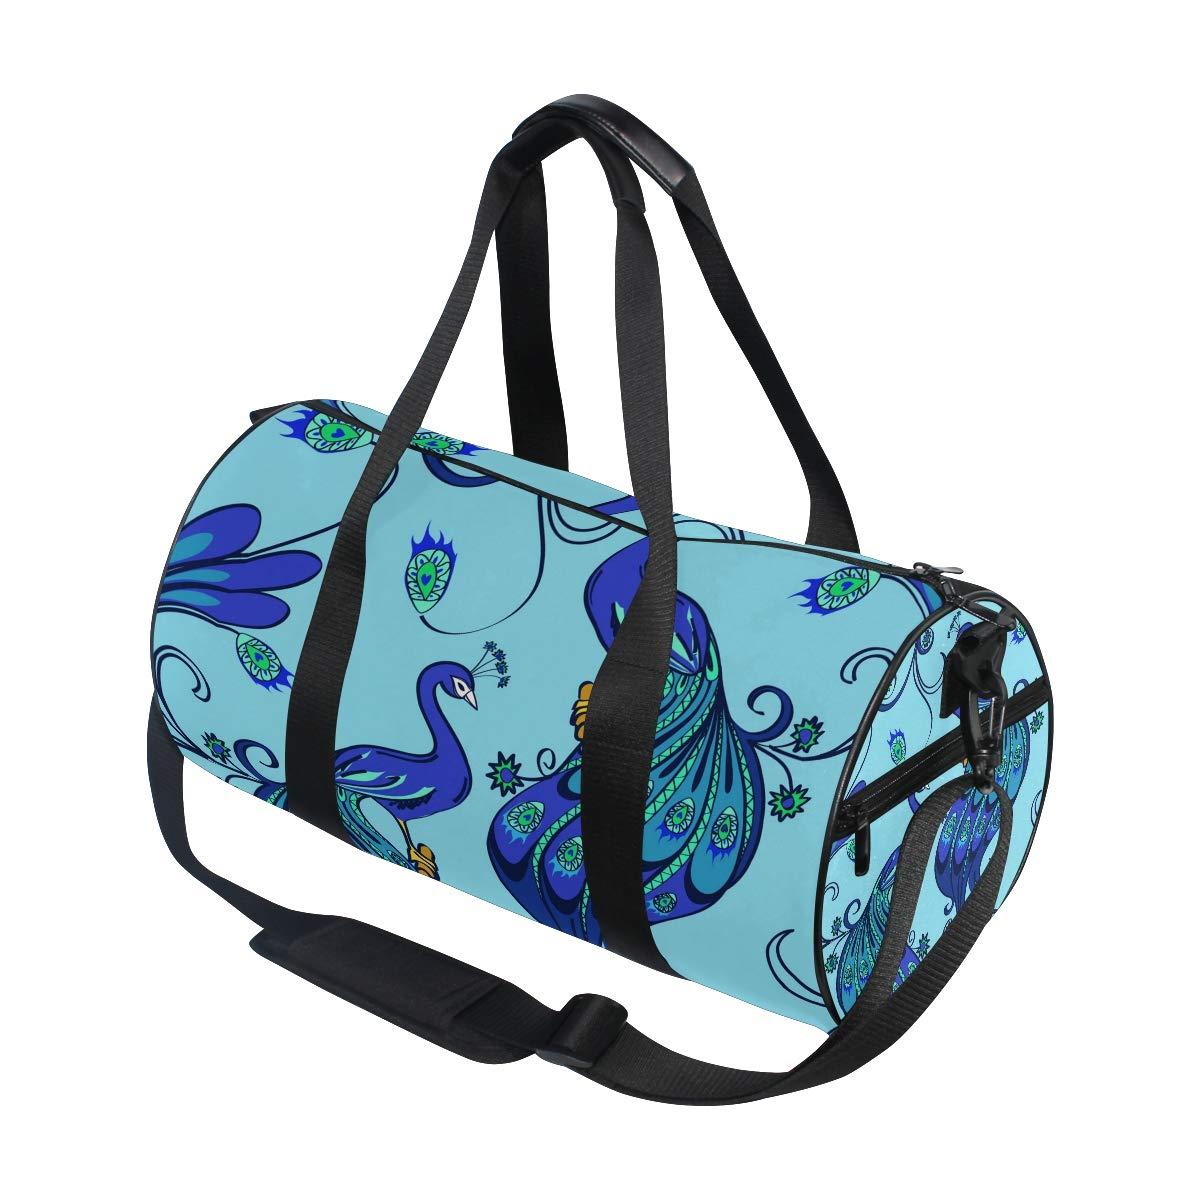 WIHVE Gym Duffel Bag Blue Magic Peacocks Sports Lightweight Canvas Travel Luggage Bag